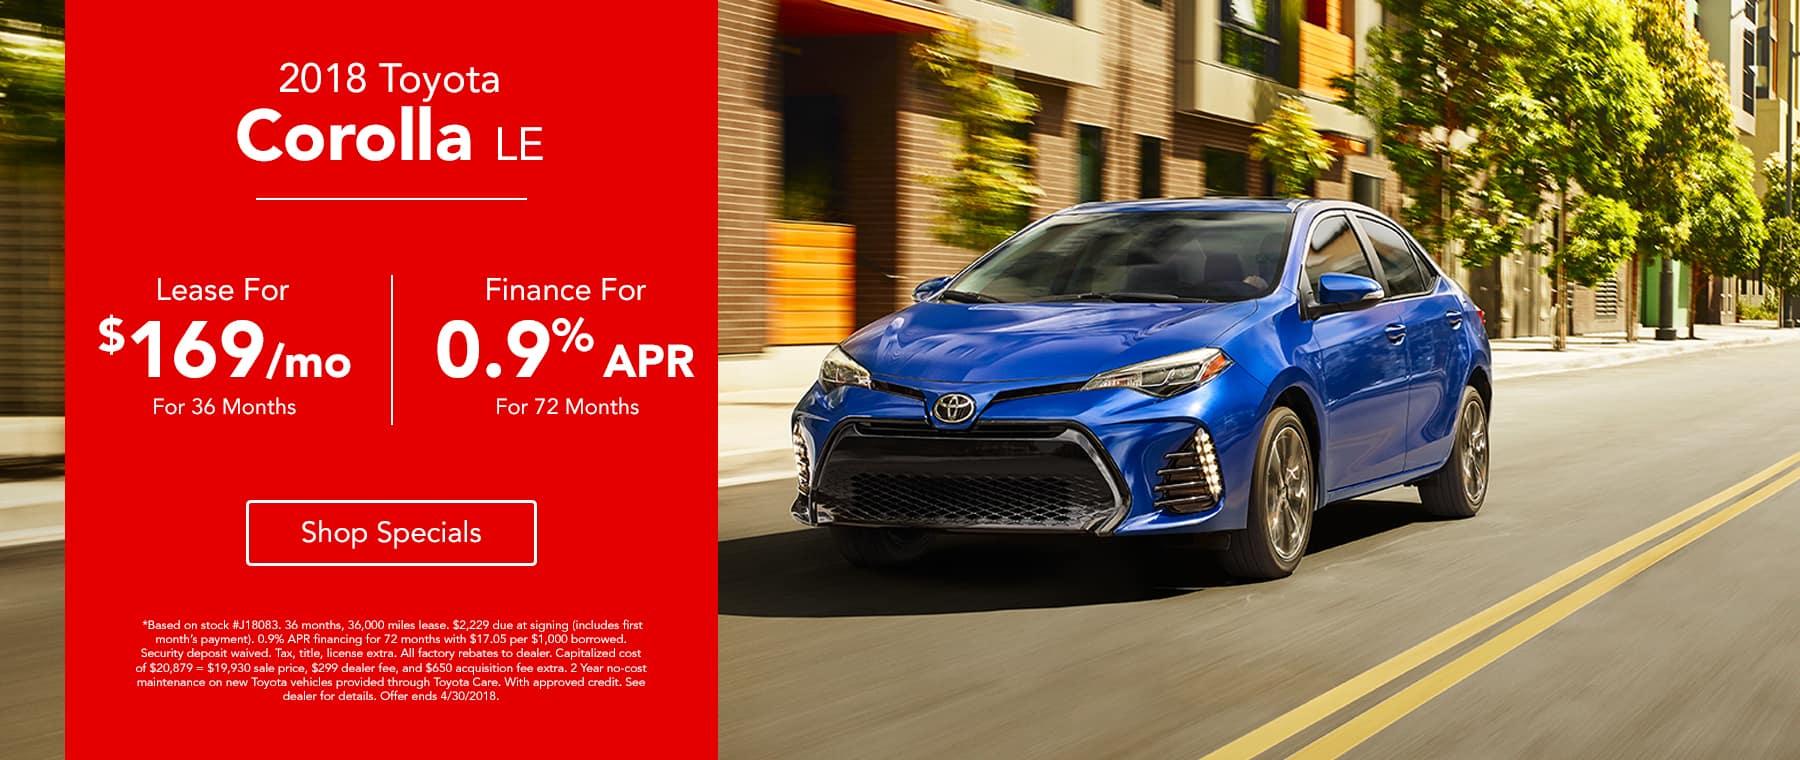 2018 Toyota Corolla - Lease for $169/mo